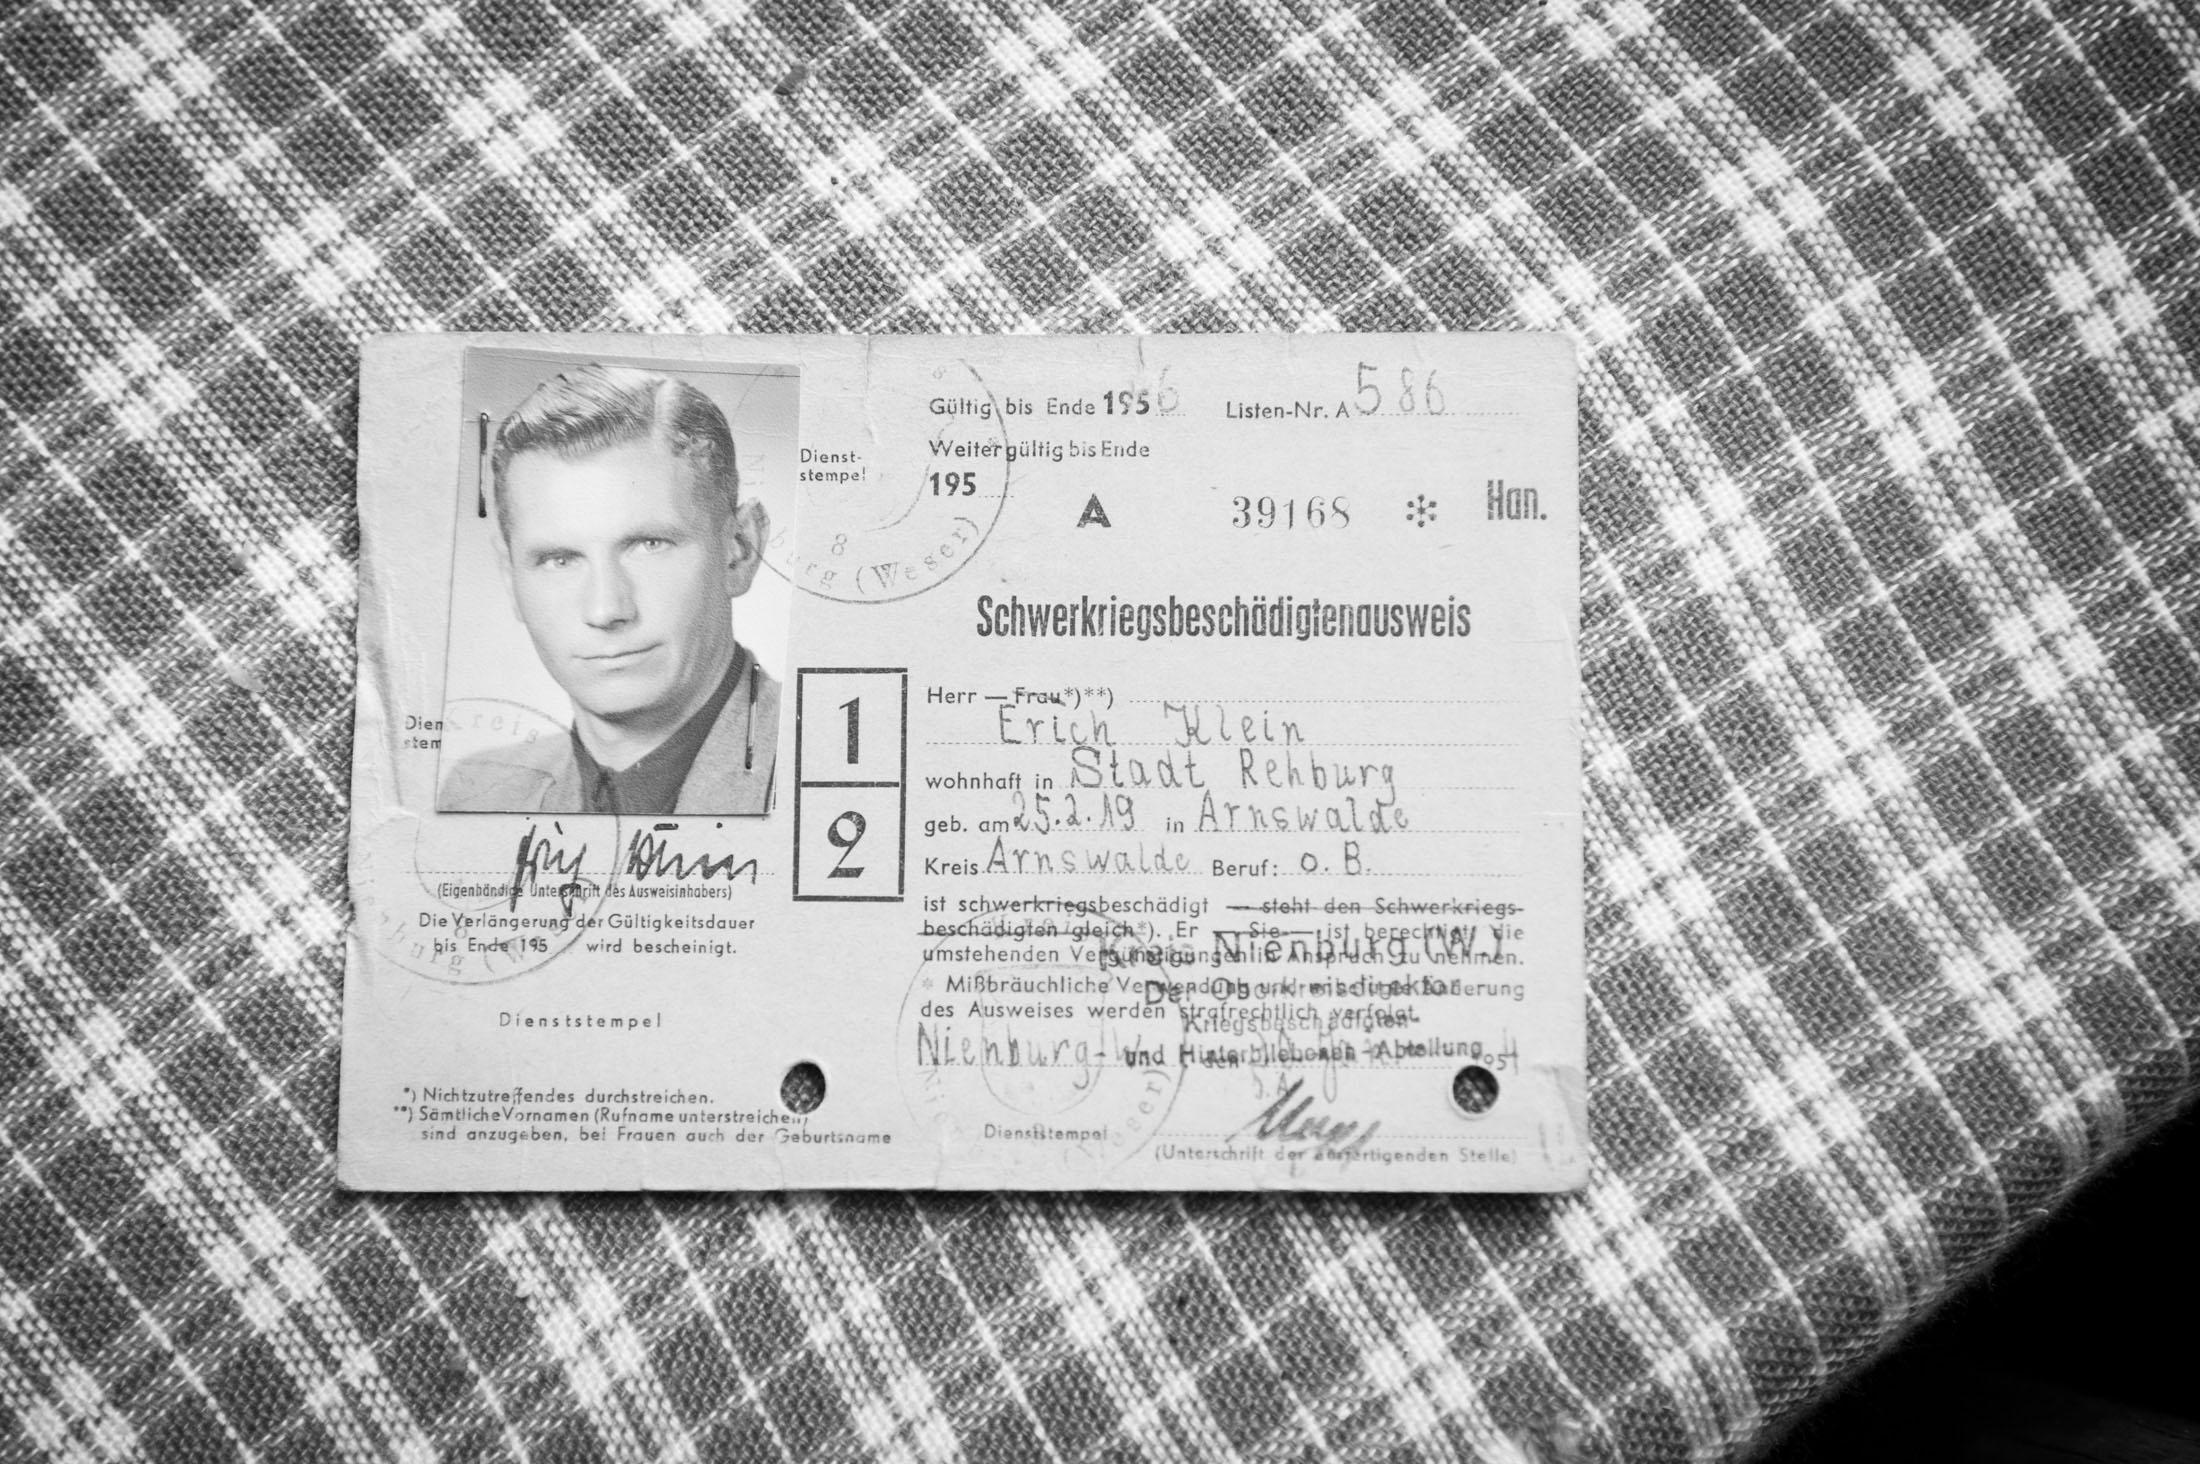 Document certifying Erich Klein's severe war disabilities (1956)